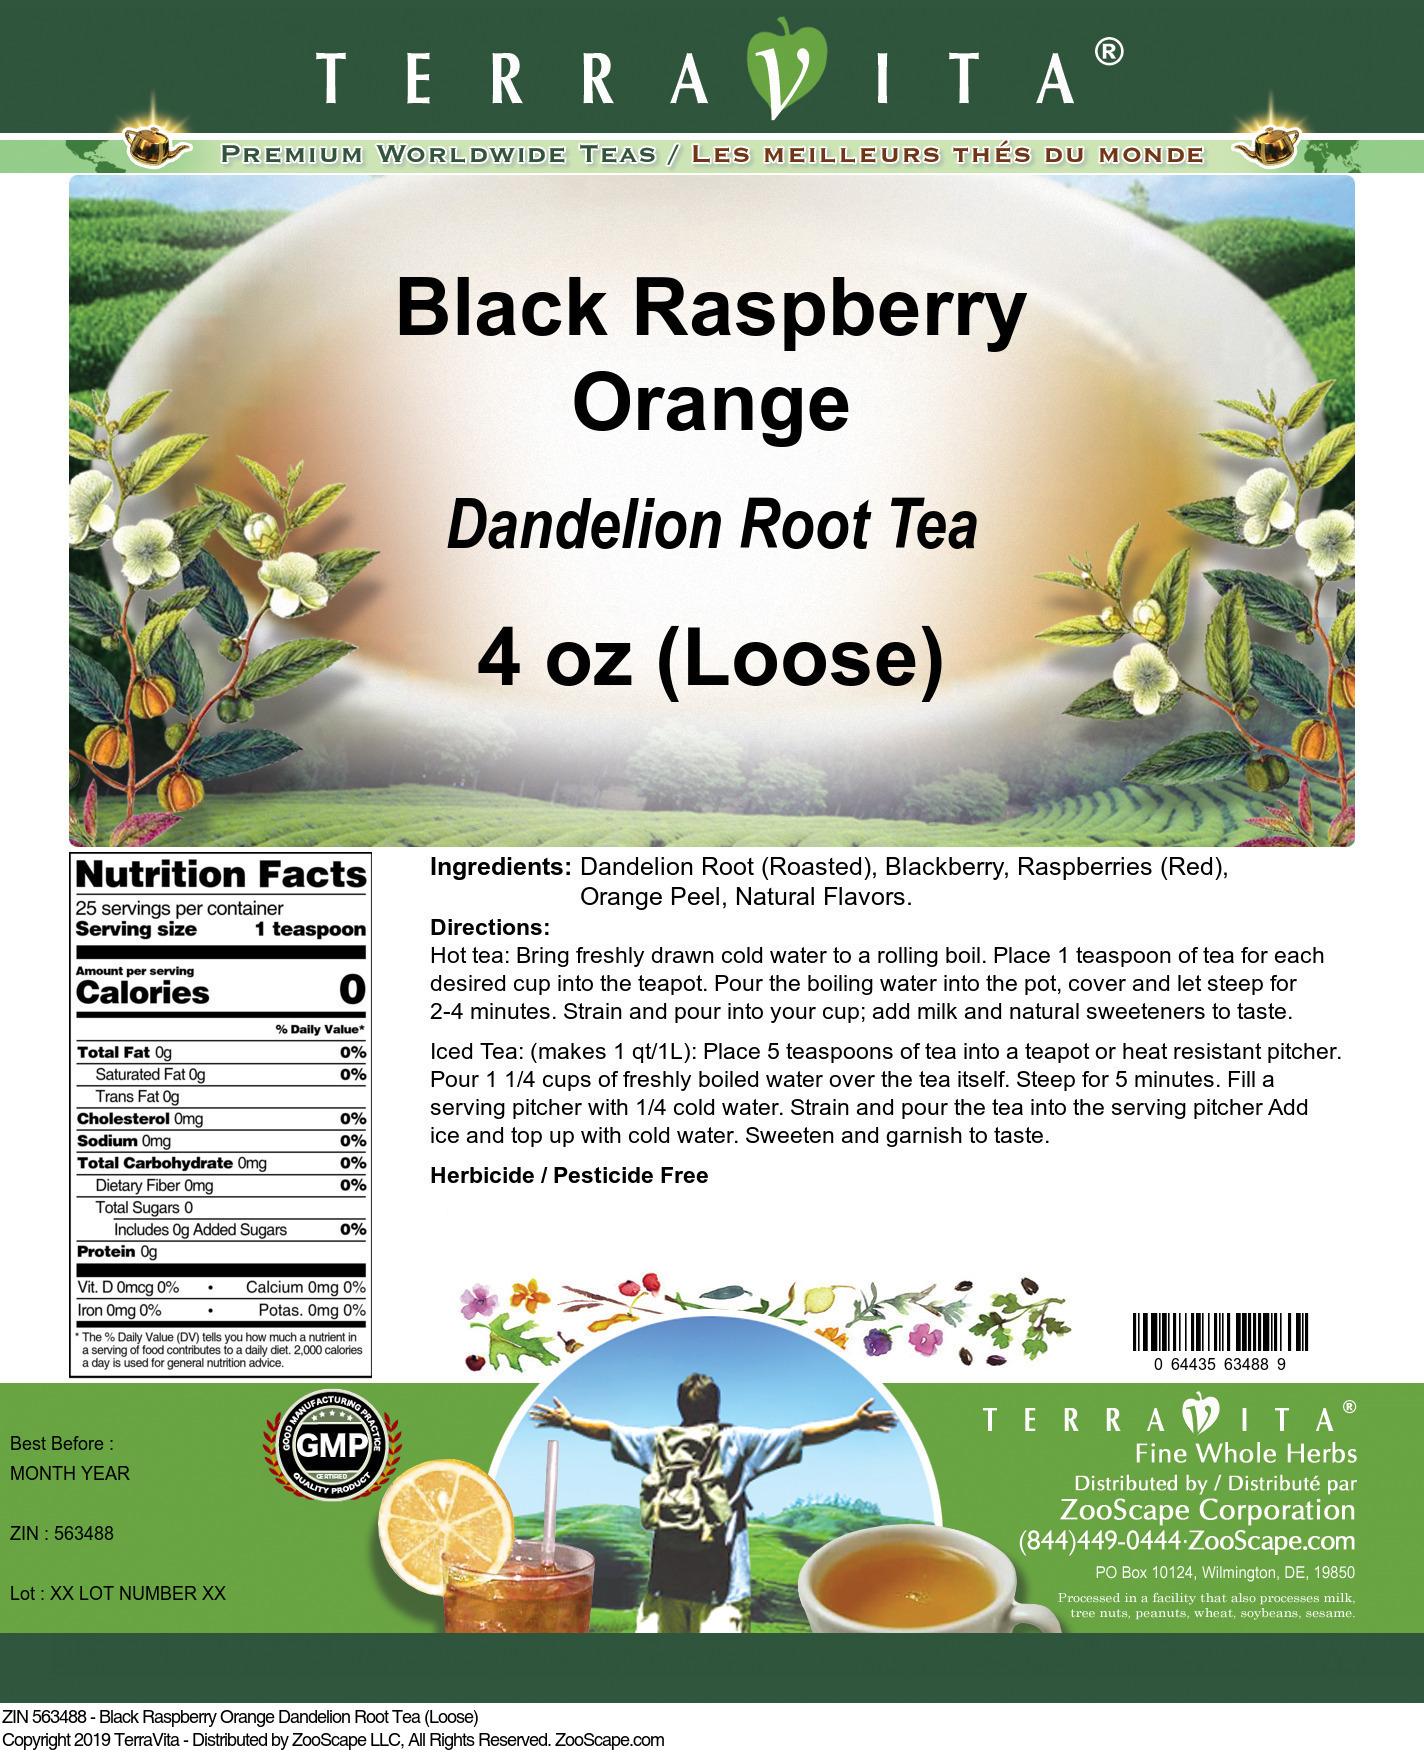 Black Raspberry Orange Dandelion Root